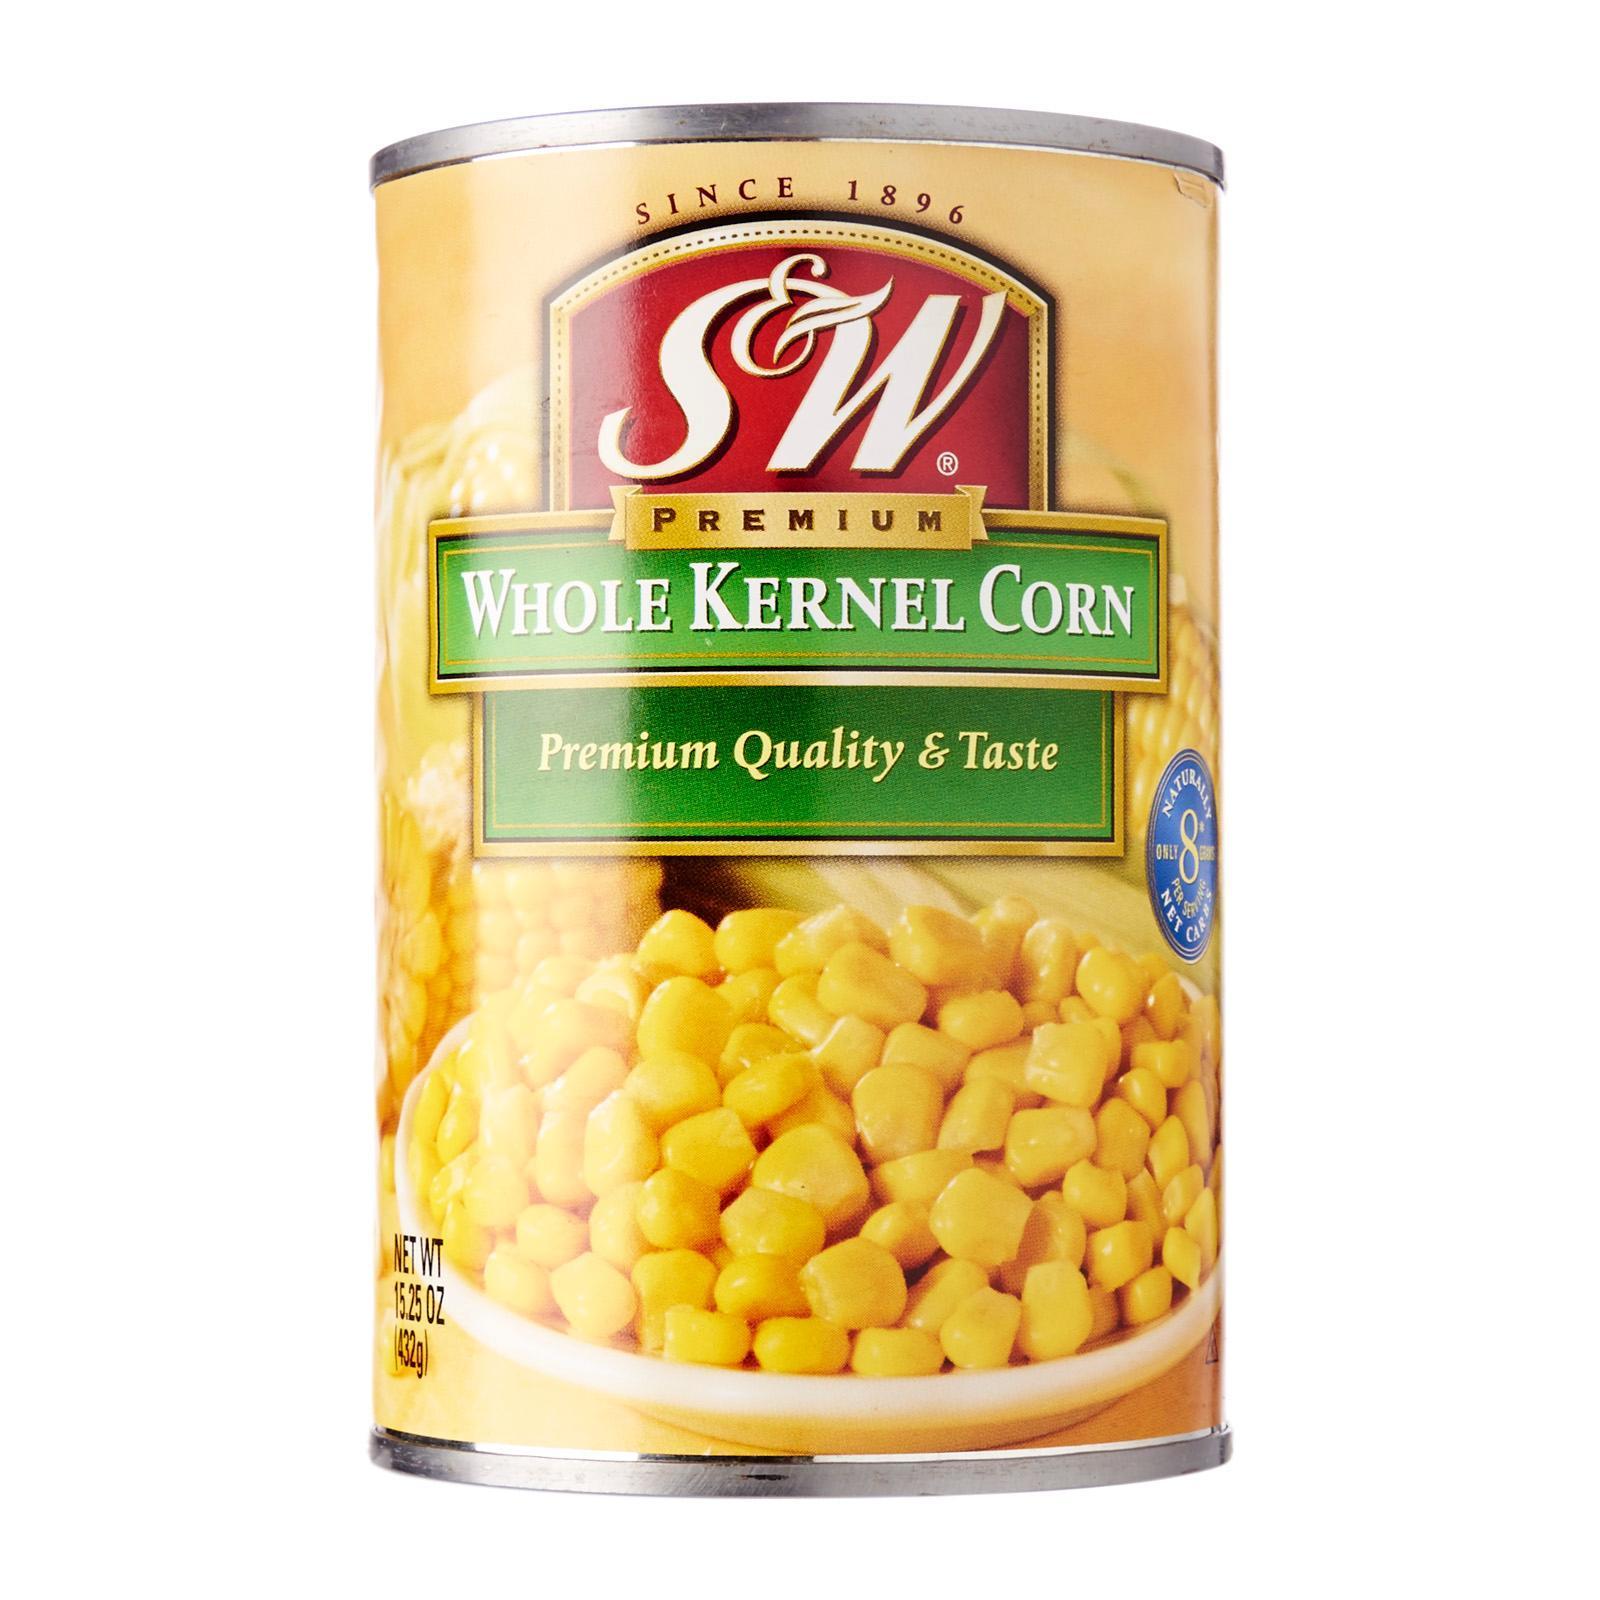 S&w Premium Whole Kernel Corn By Redmart.